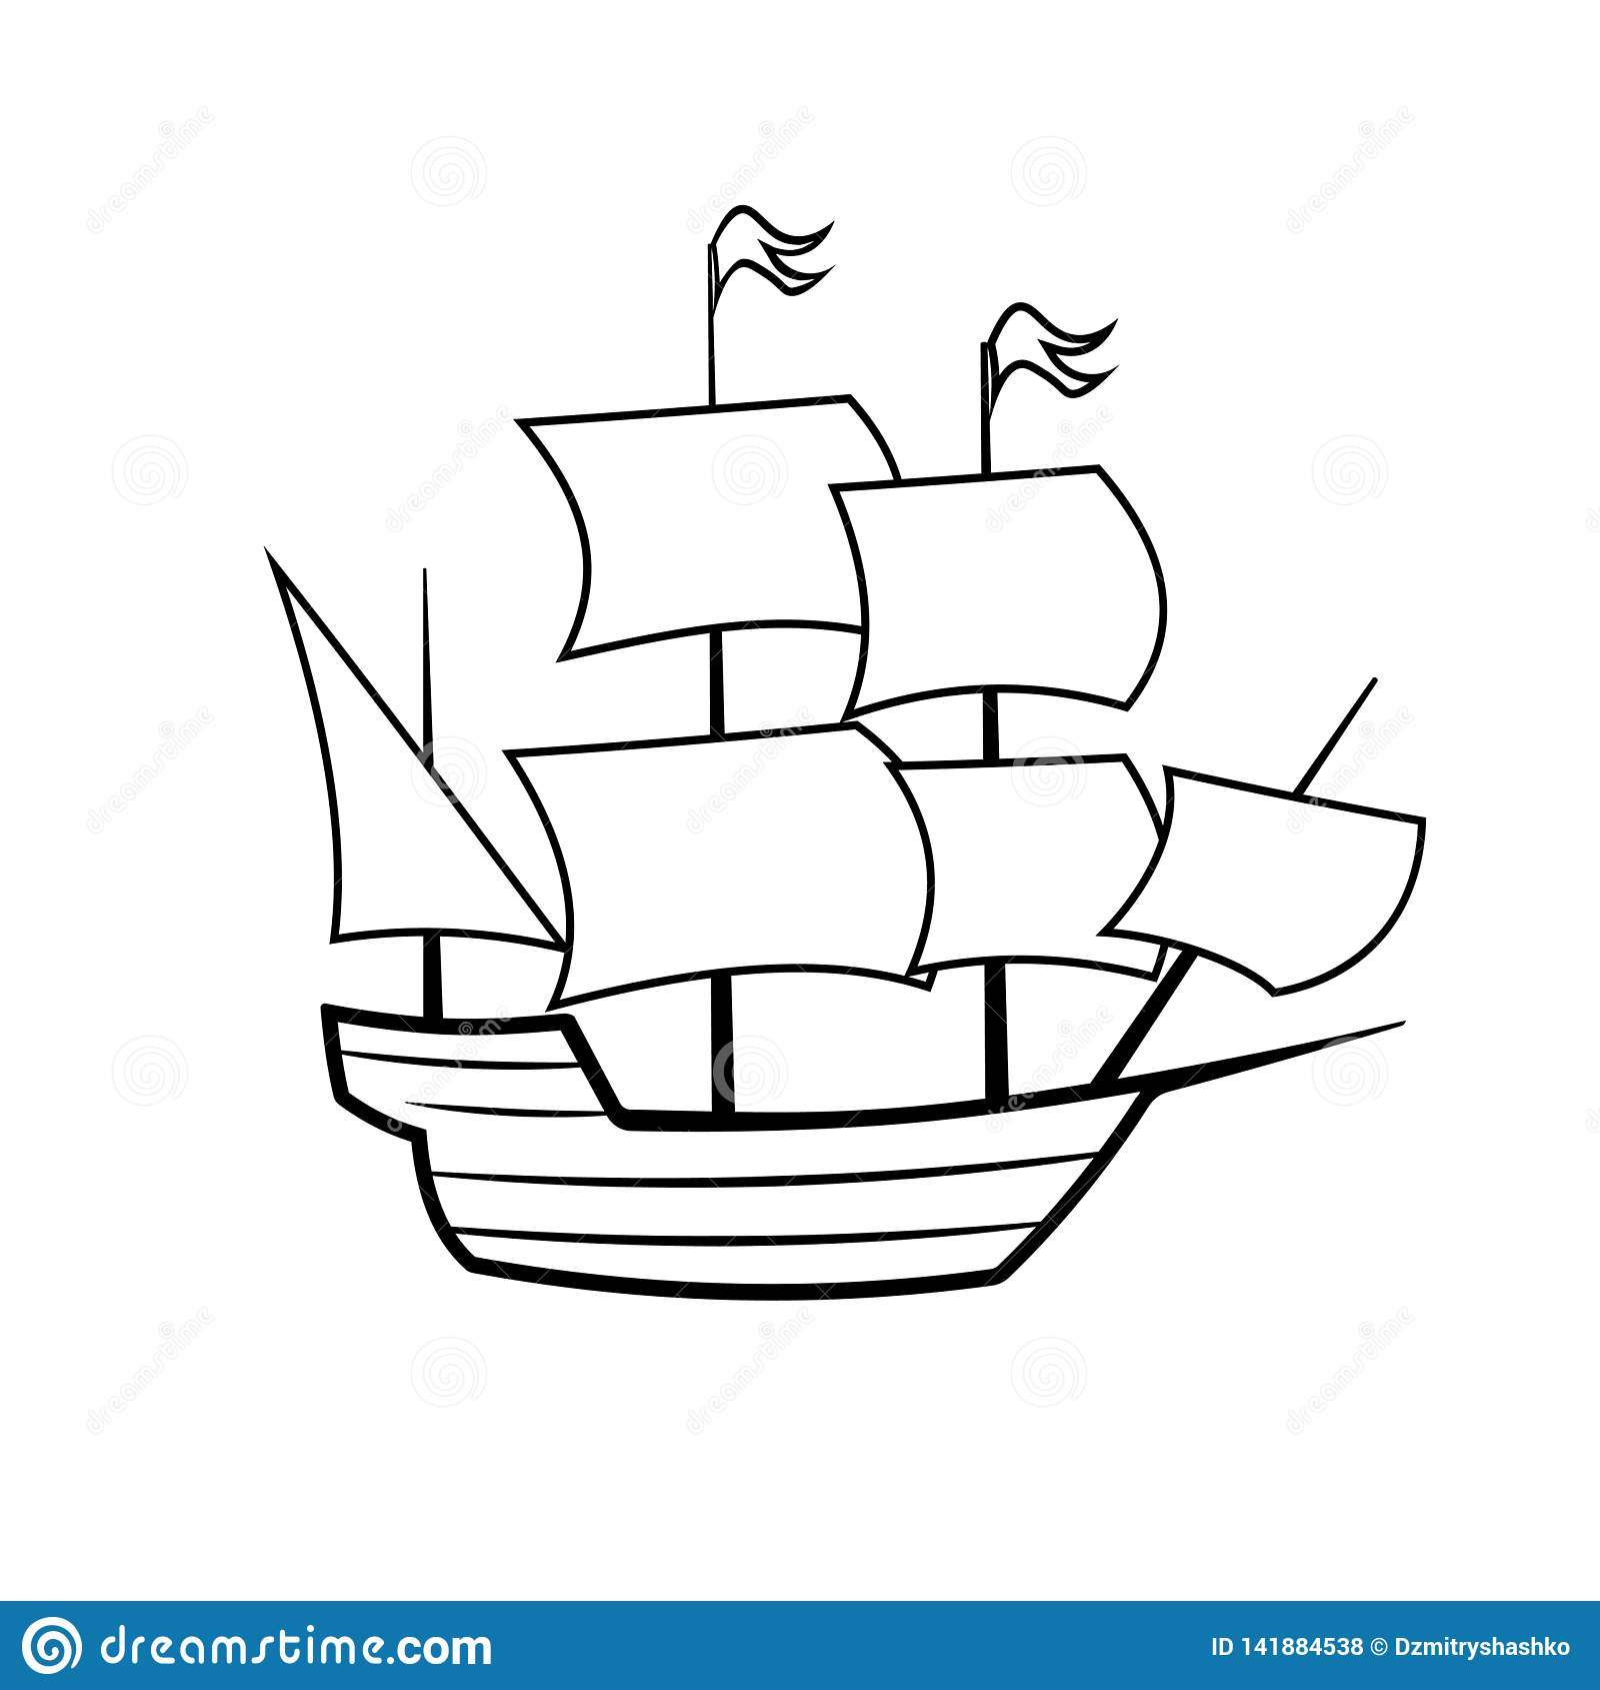 Mayflower Ship Outline Icon Stock Vector - Illustration of ...